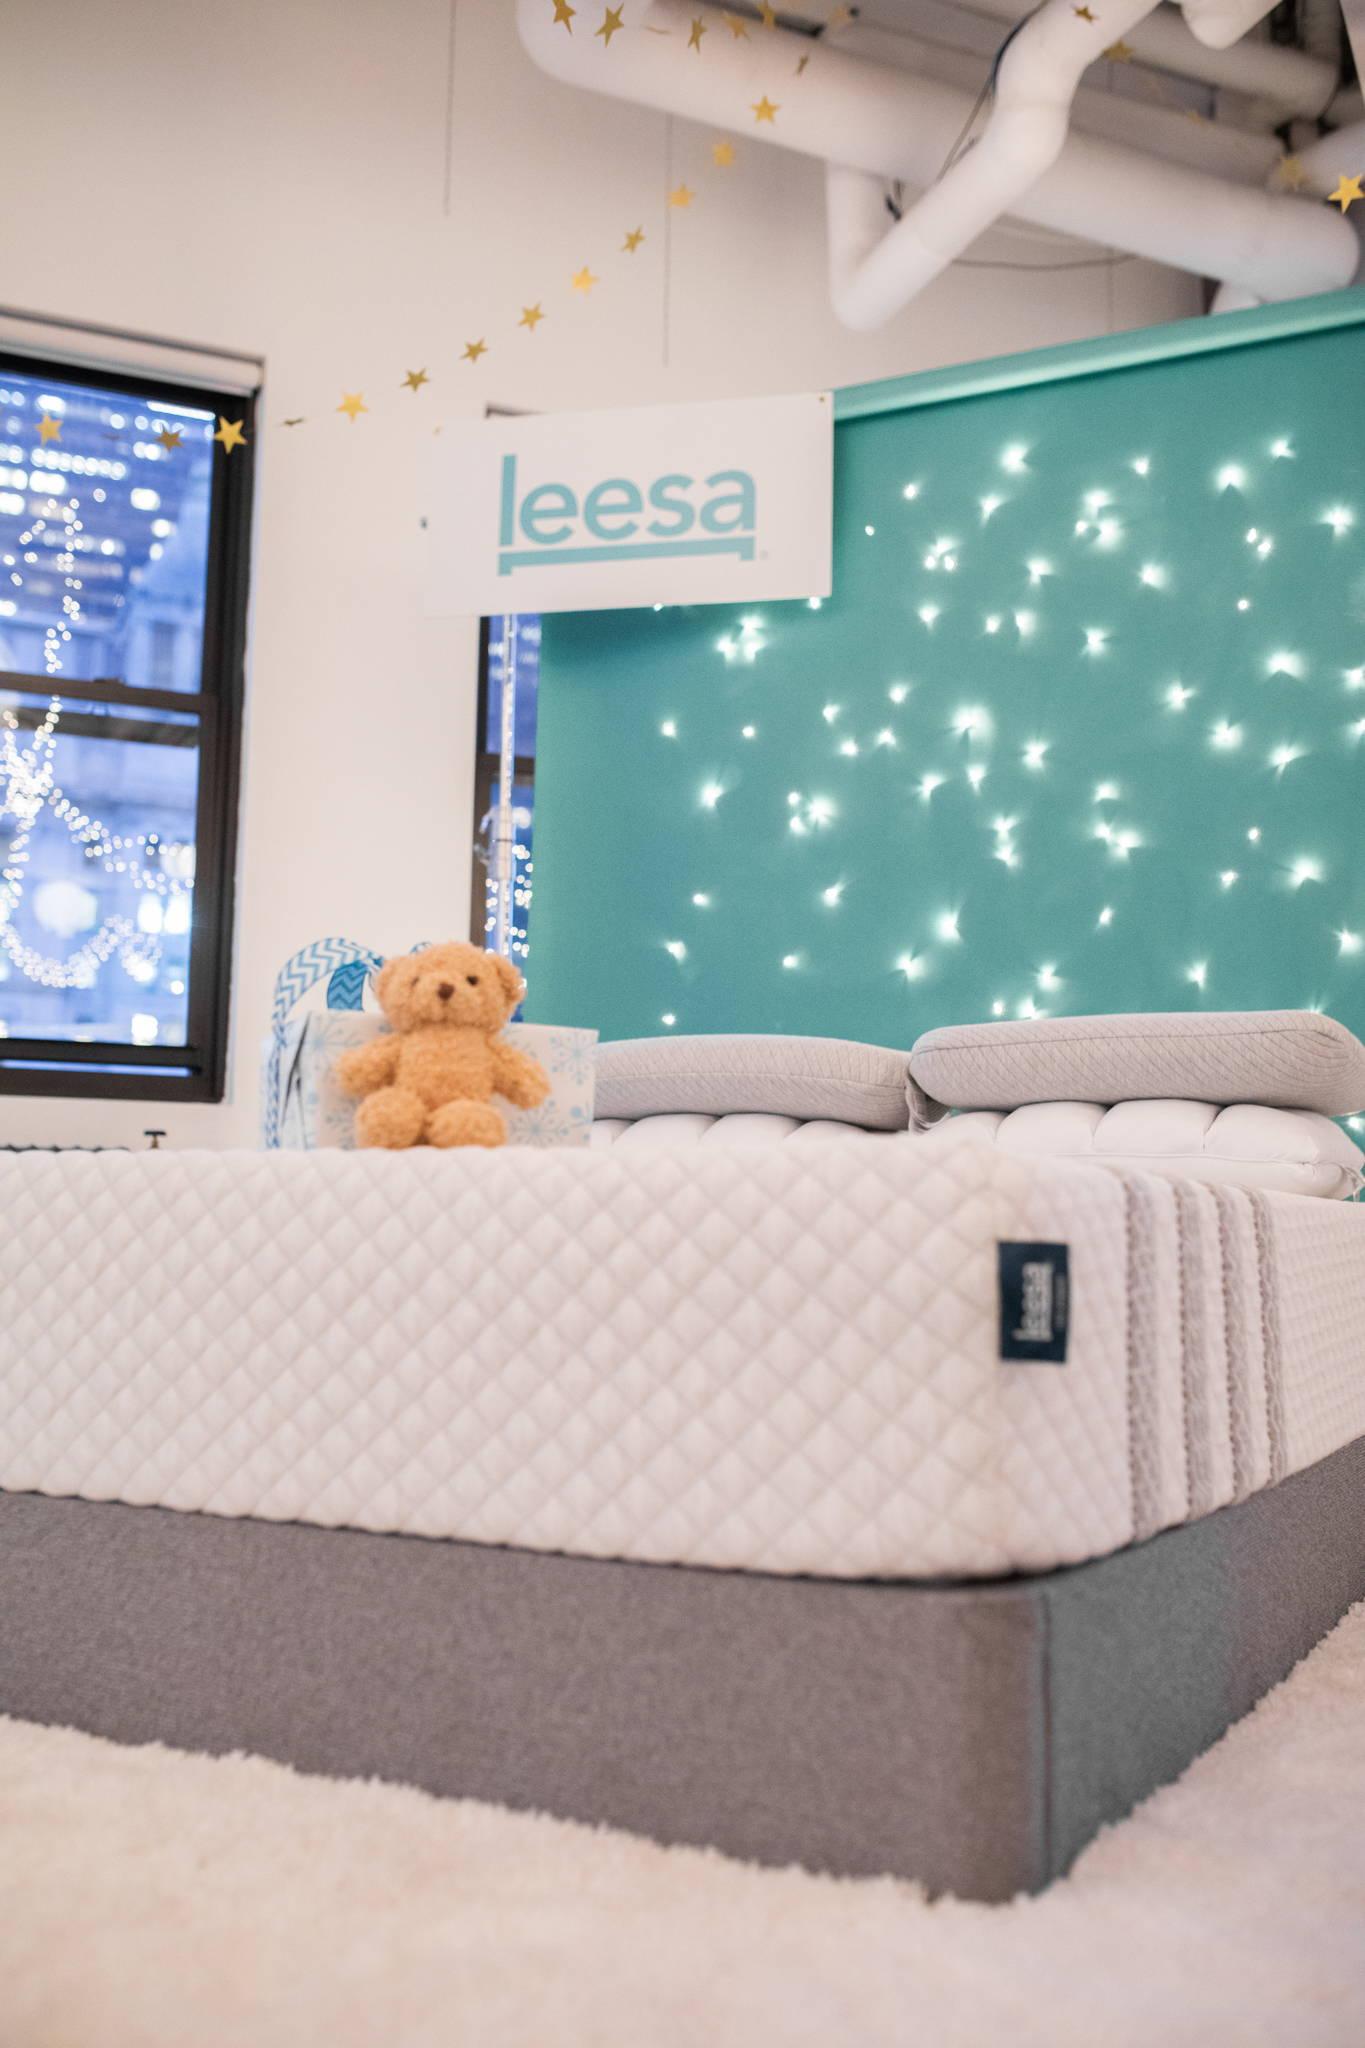 Leesa x Refinery 29 Sweet Dreams Event 5